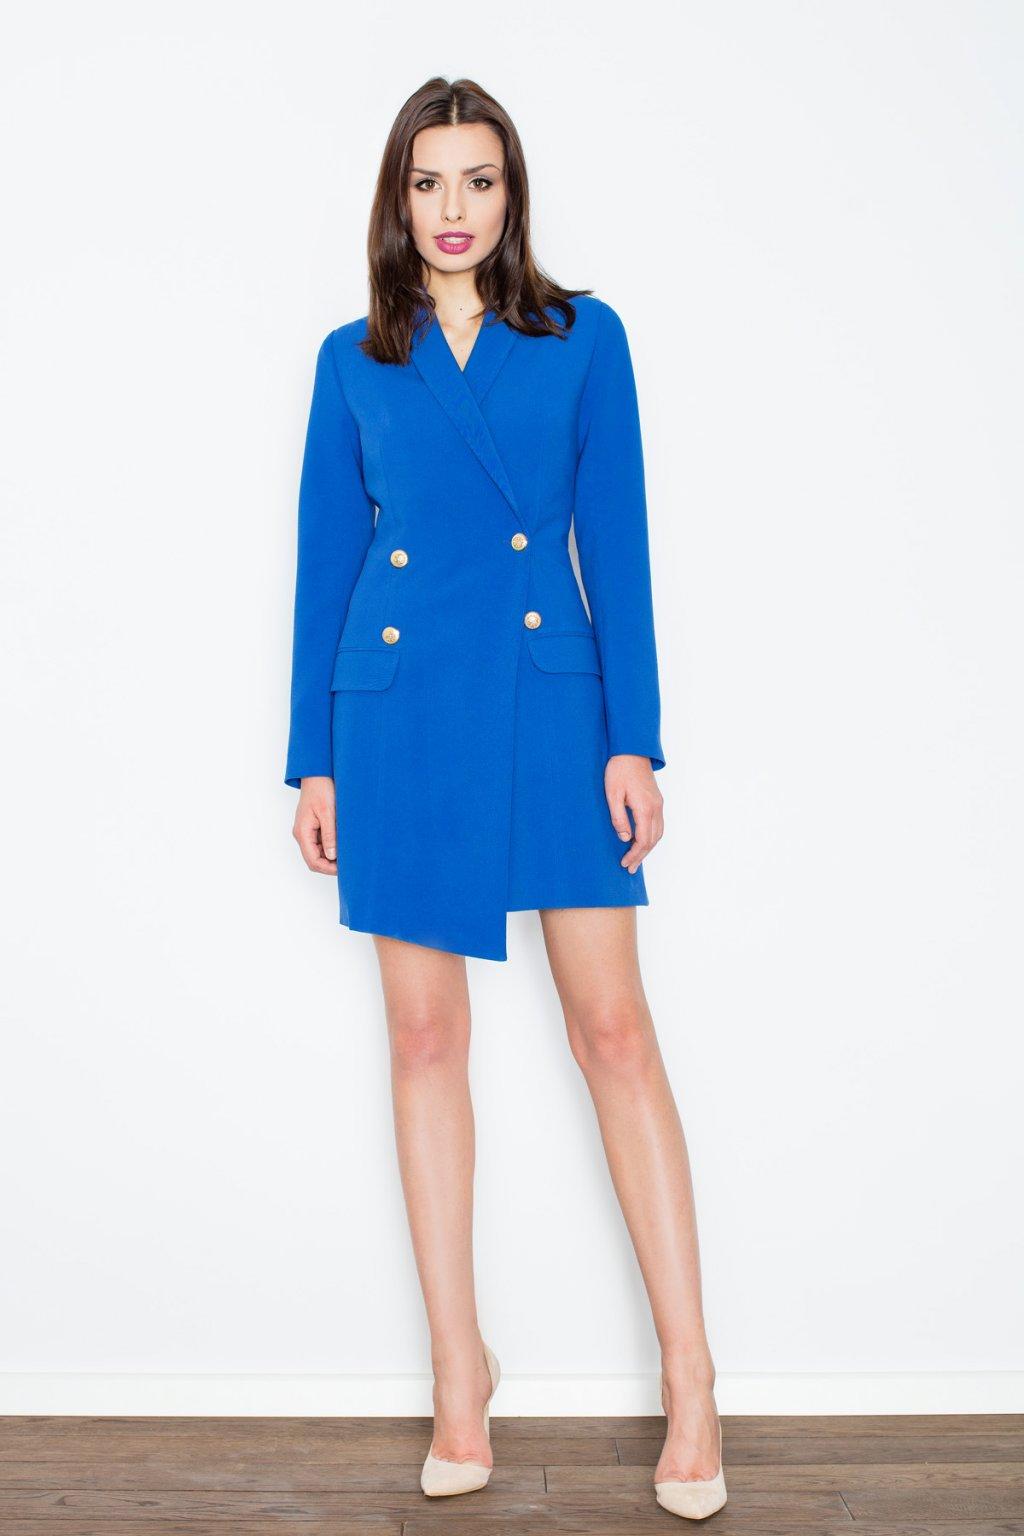 M447 blue#1